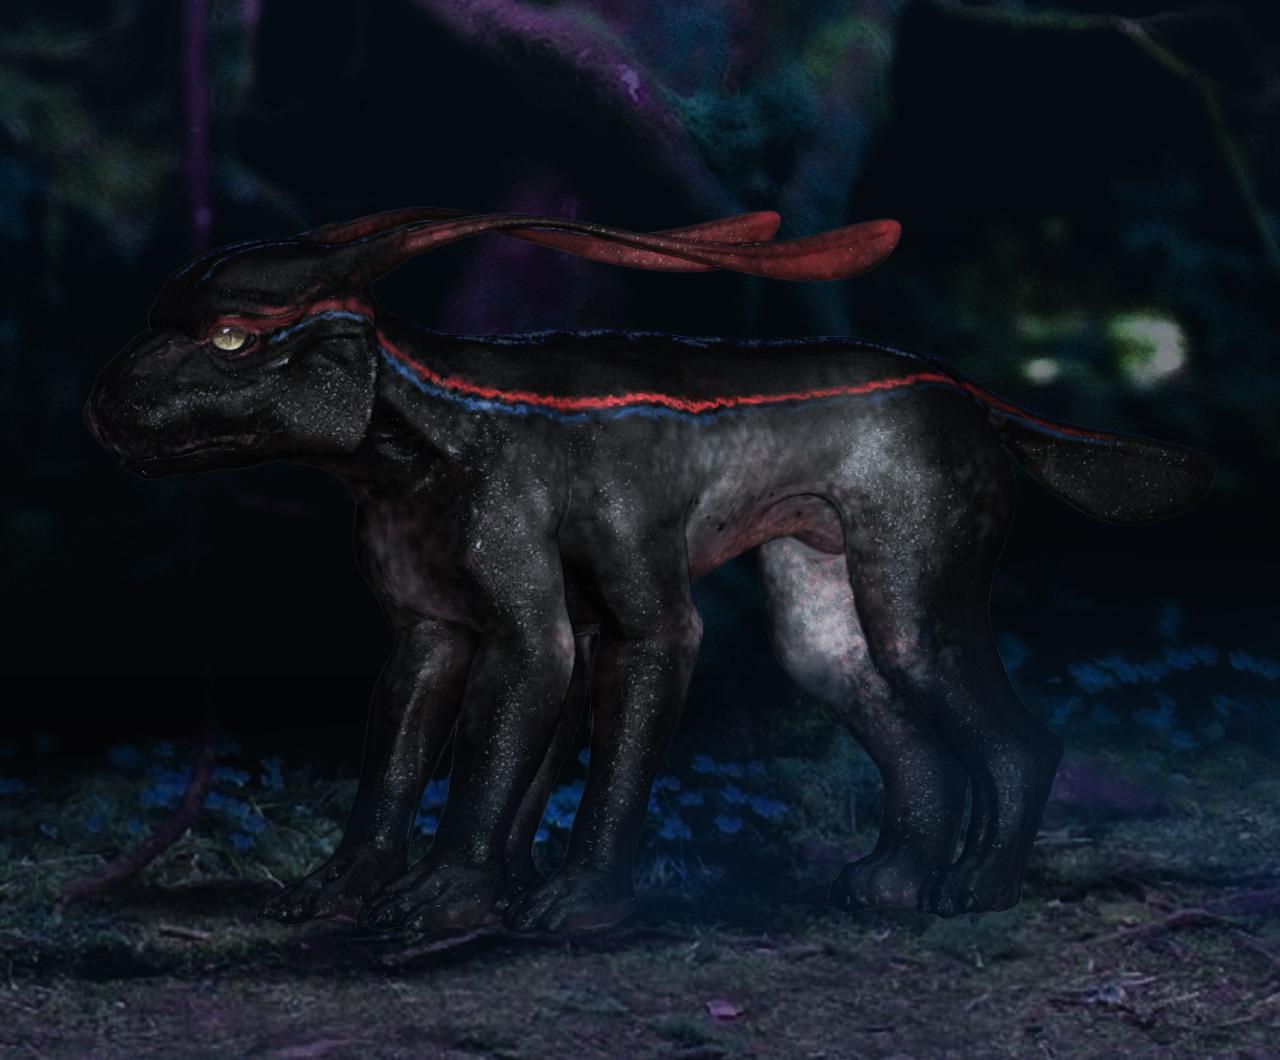 File:Viperwolfcub.jpg